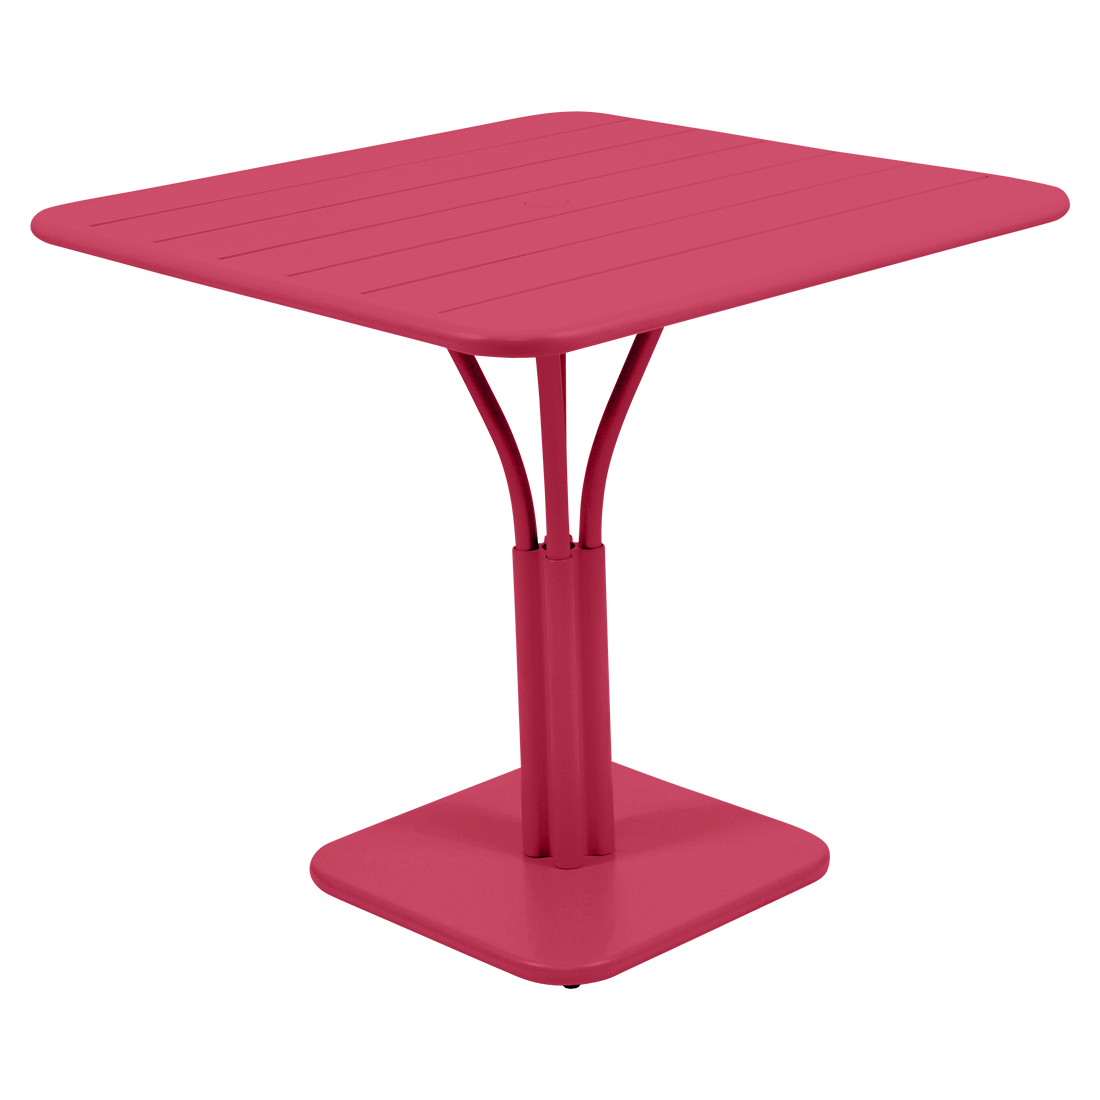 table de jardin, table metal, petite table, table rose